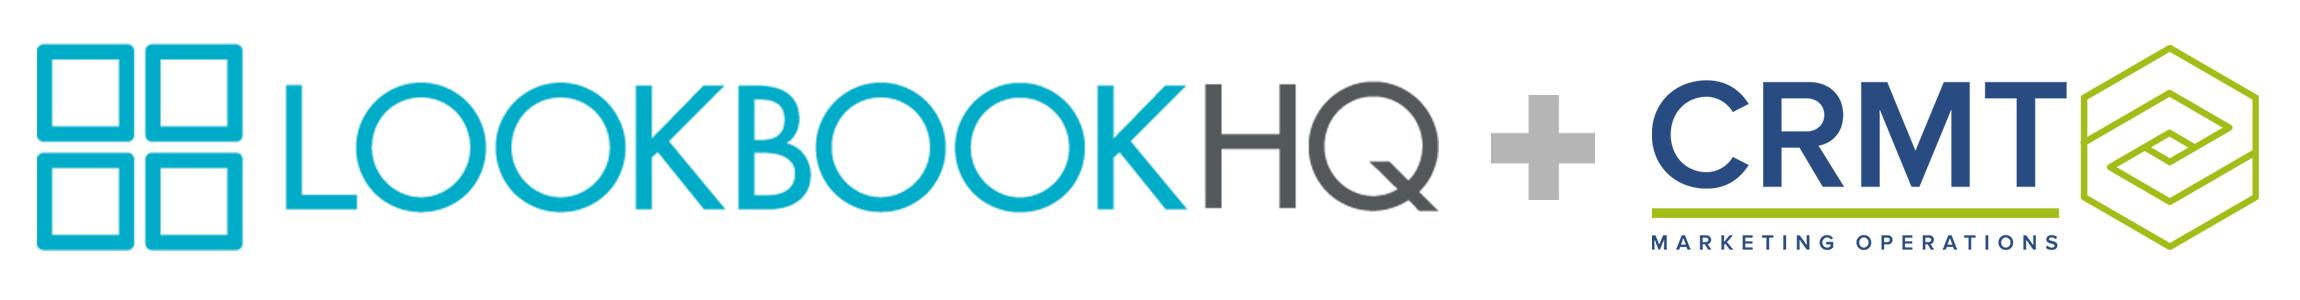 CRMT Announces Strategic Partnership with LookBookHQ